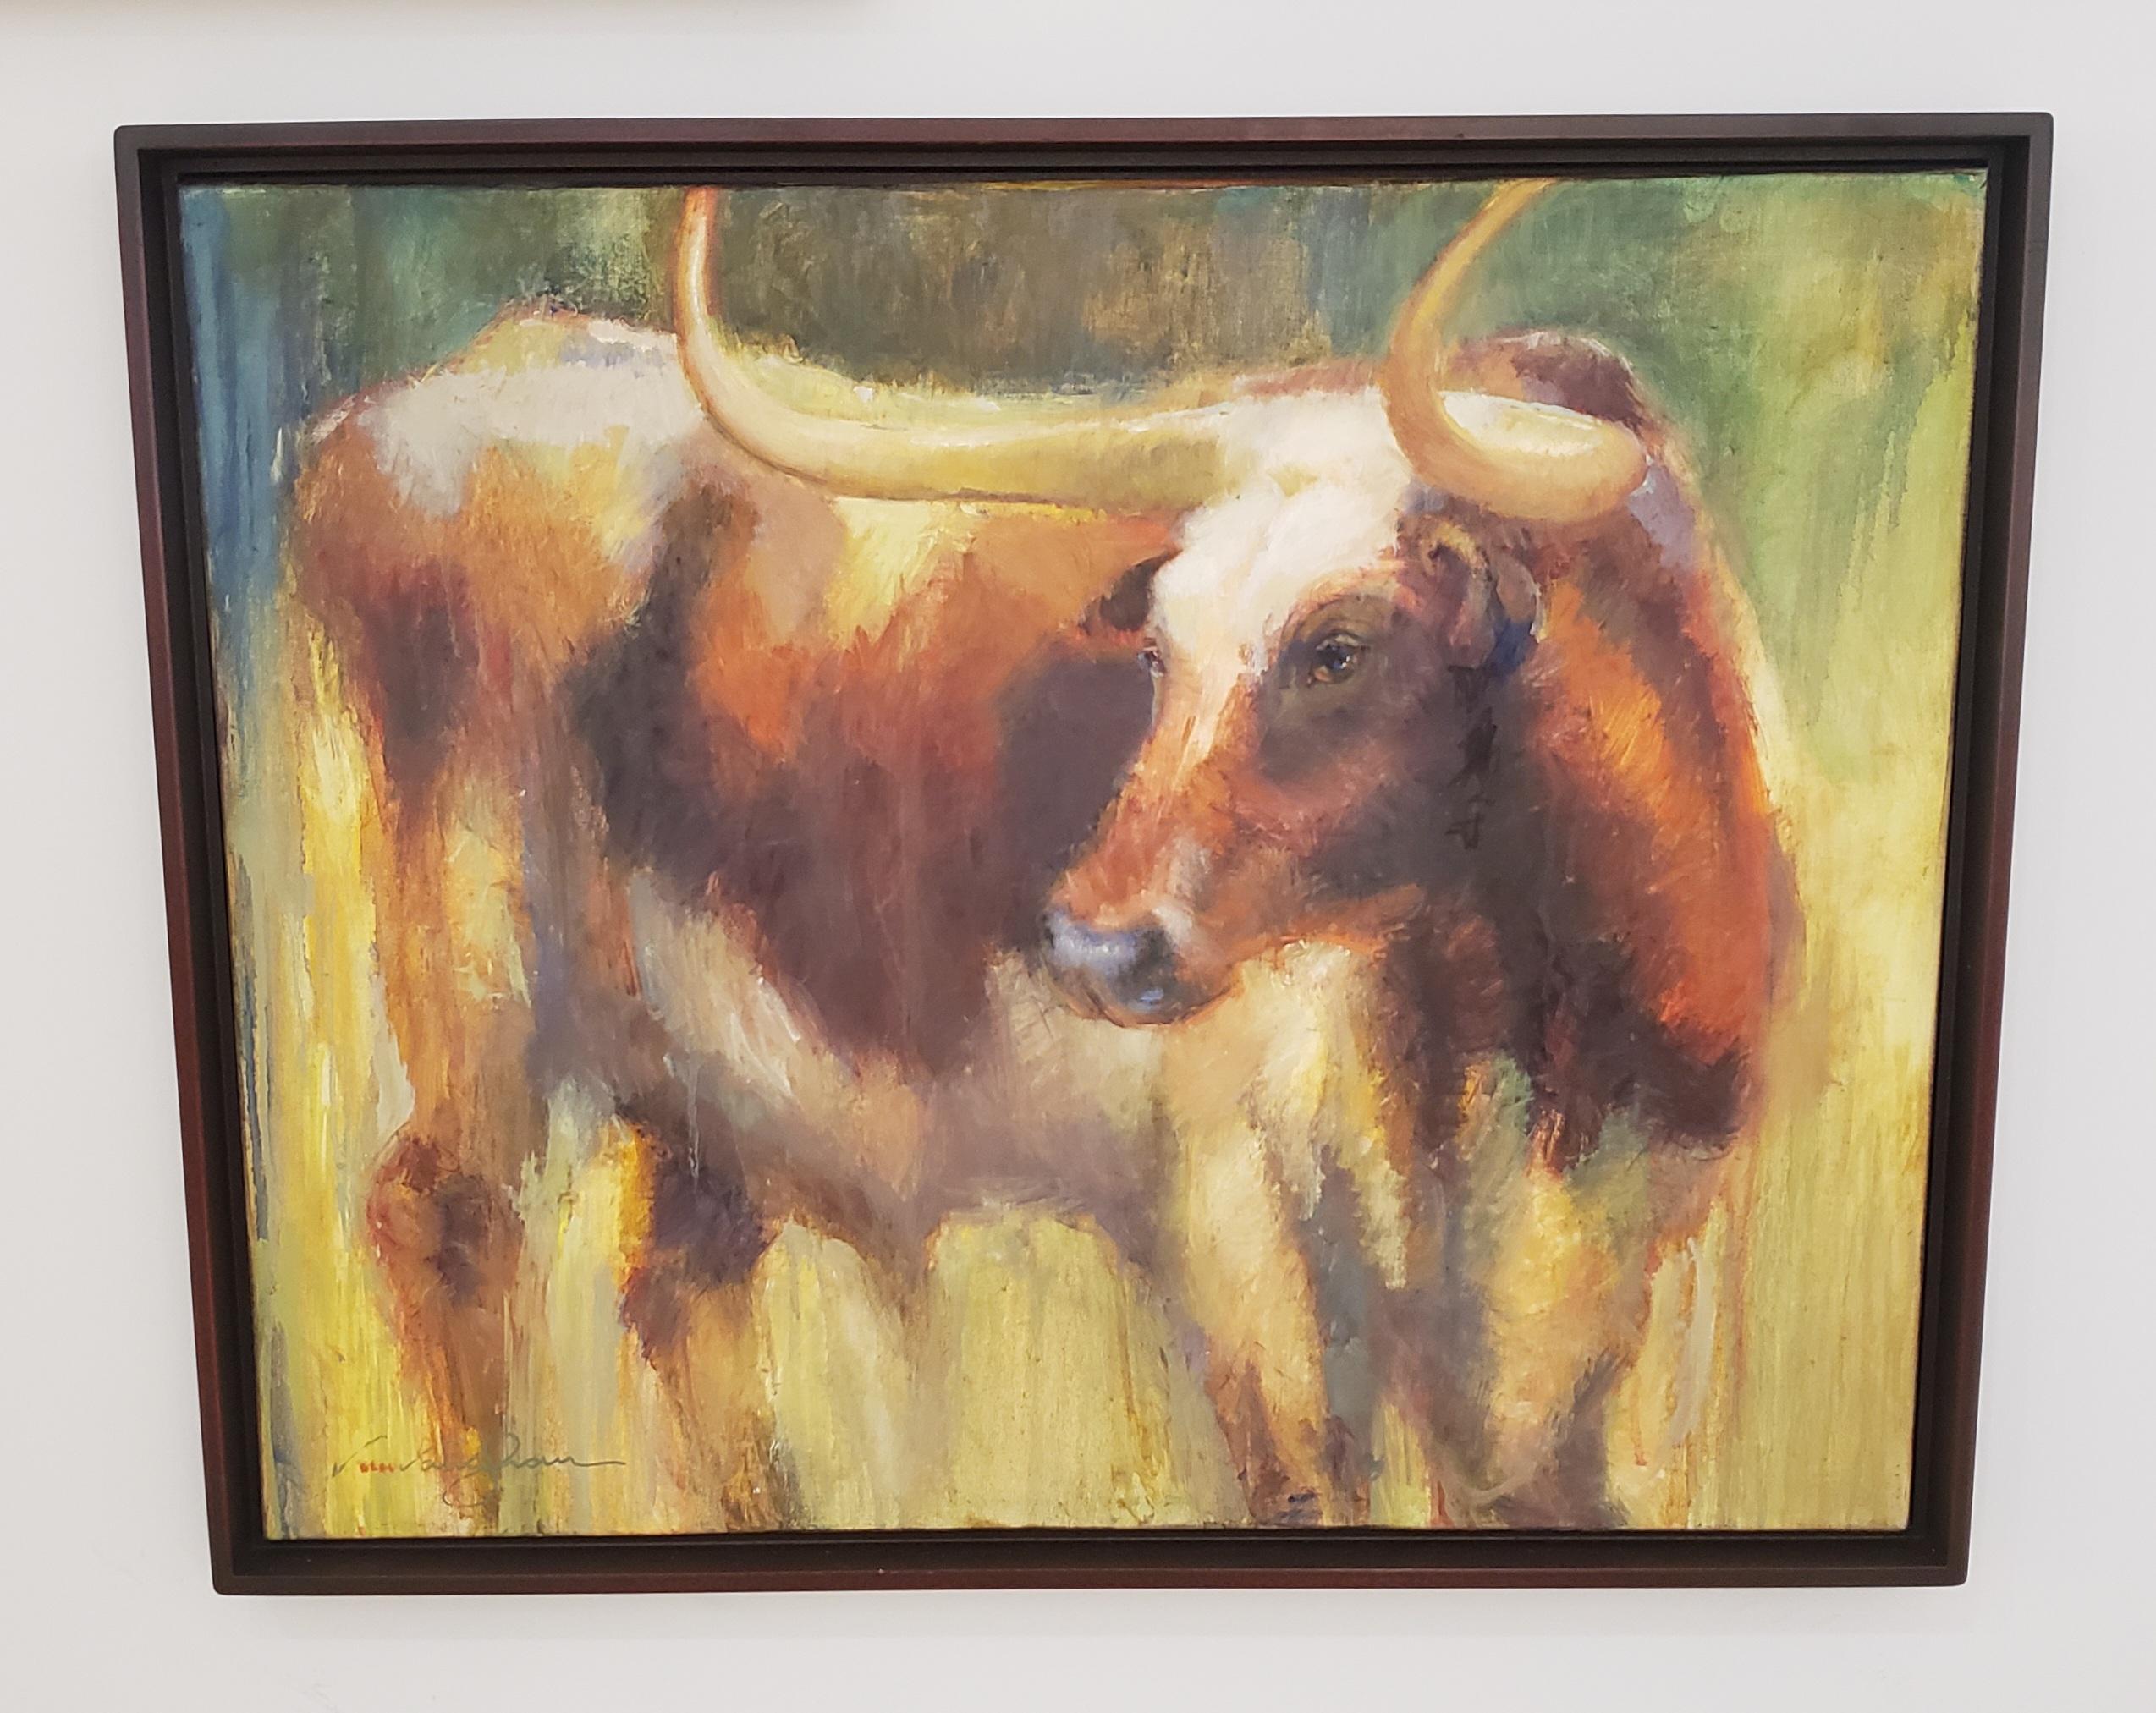 Gaze ,Texas Cattle, Impressionism ,Texas Ranches, Texas Artist, Framed